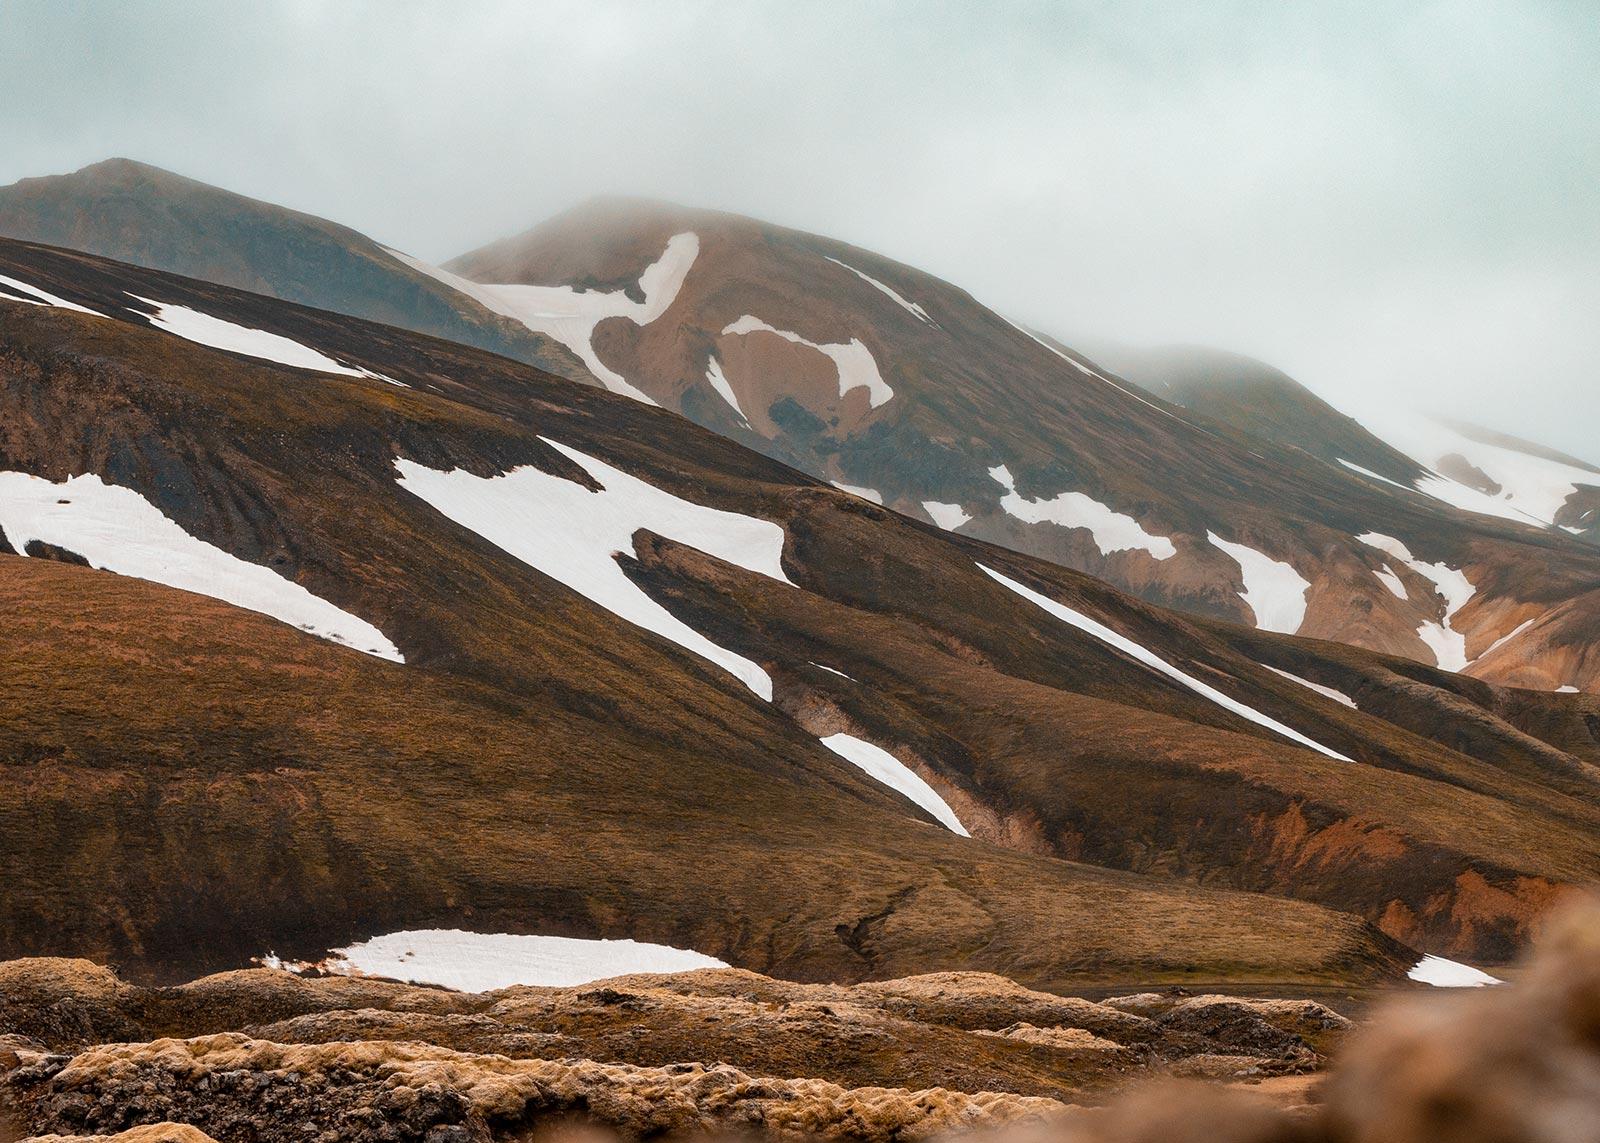 Landmannalaugar mountains and landscape